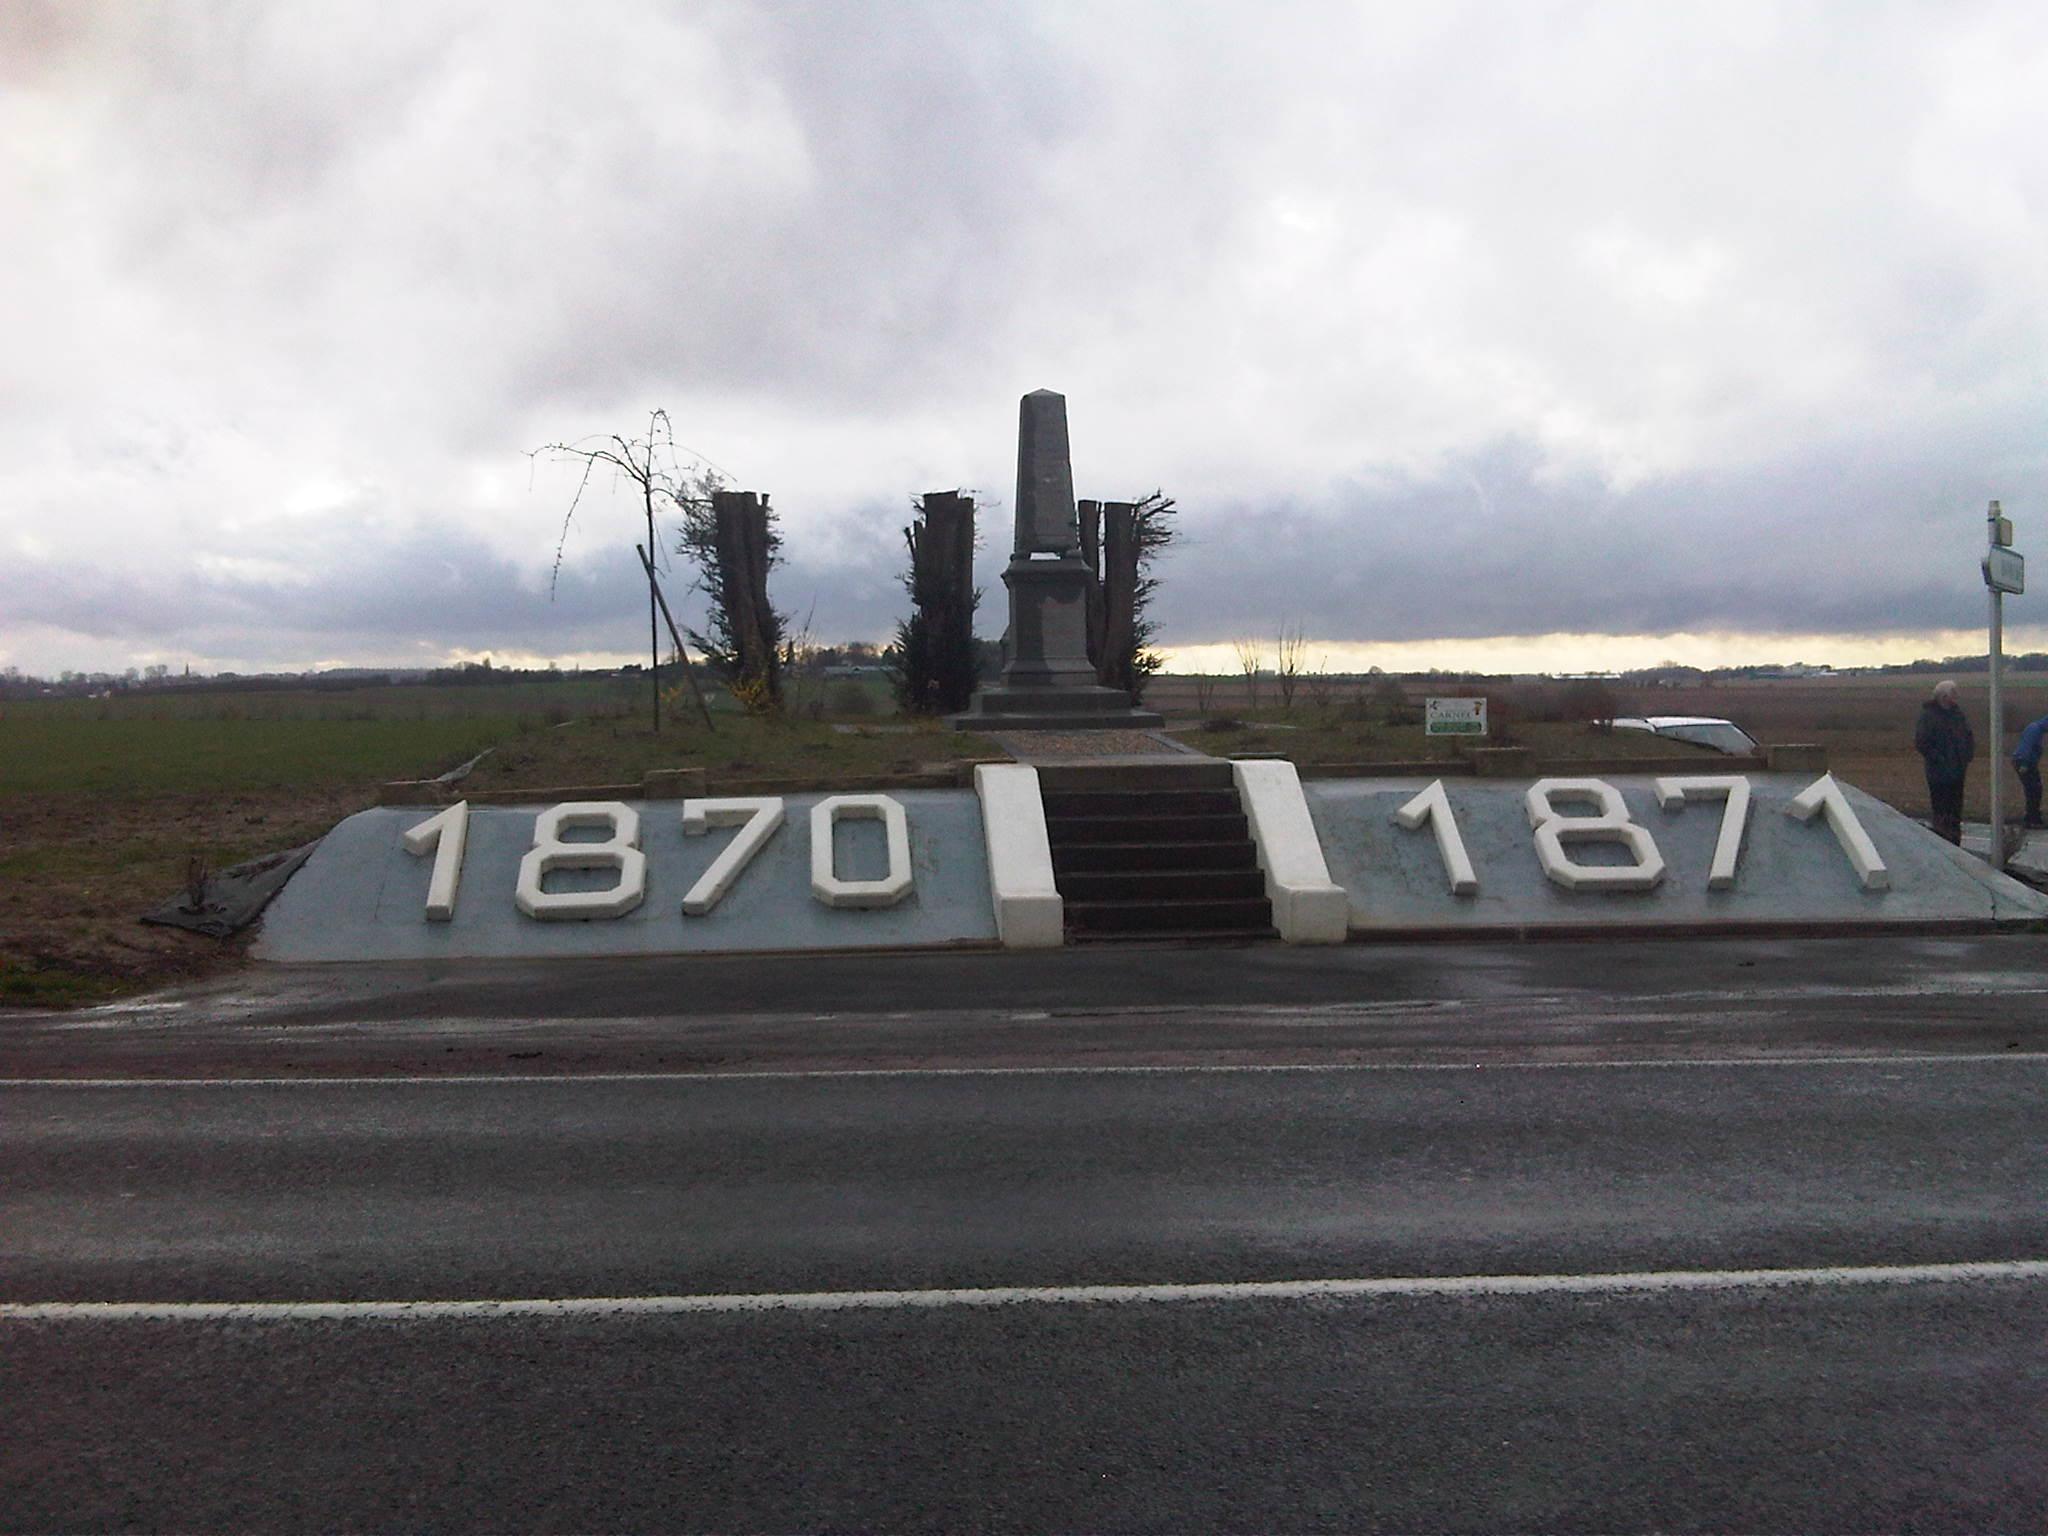 1870-71 memorial near Bapaume